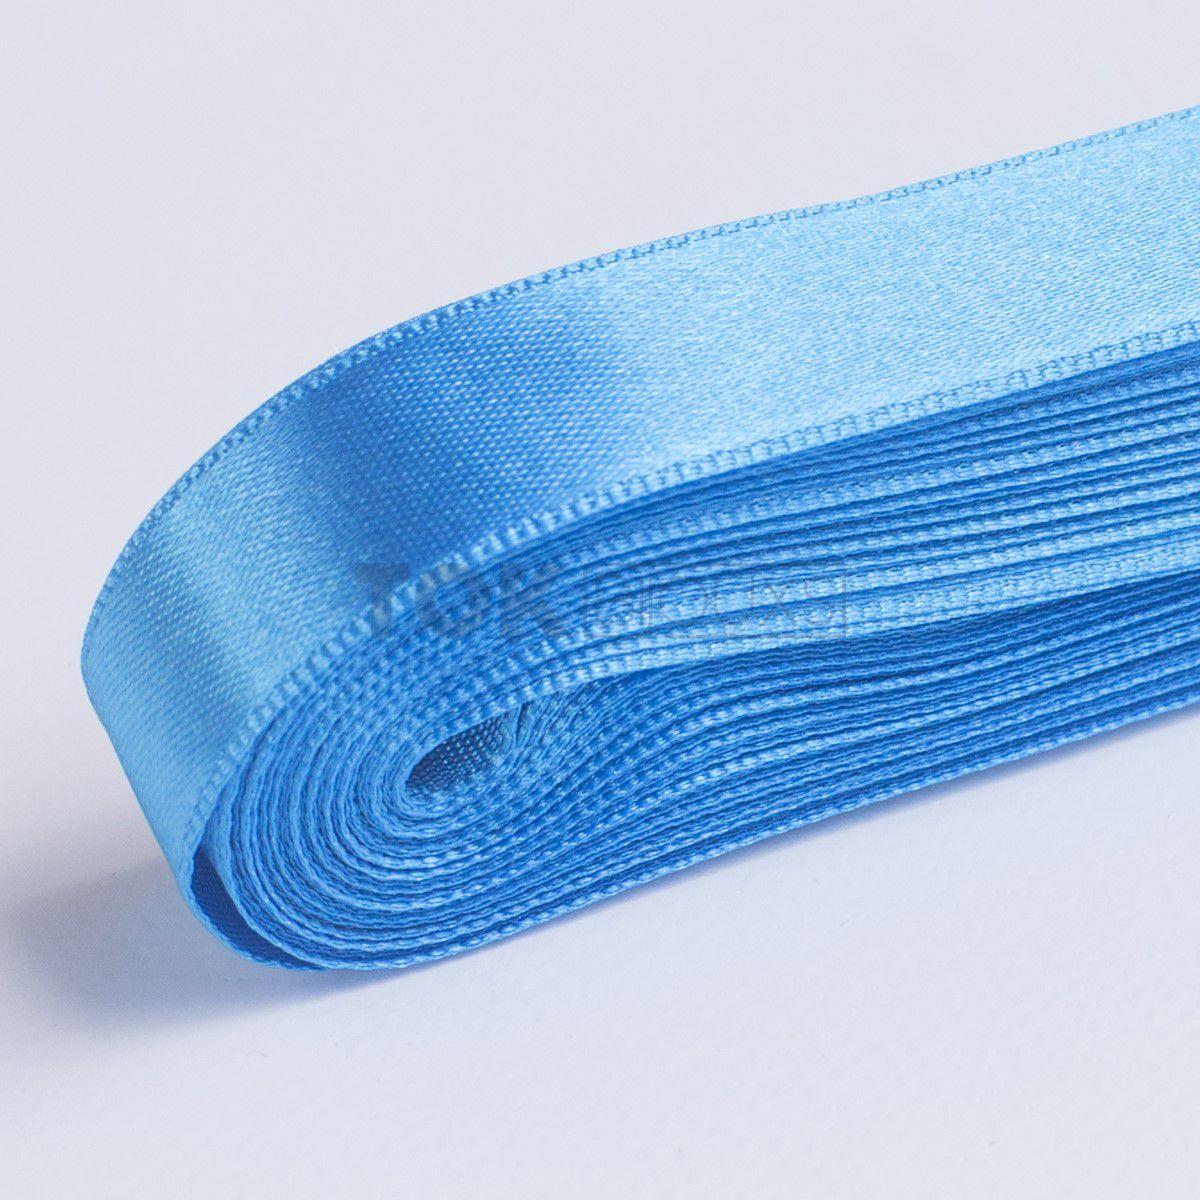 Fita Cetim N.1 - 7mm - 10 Metros - COR (21) Azul Turquesa